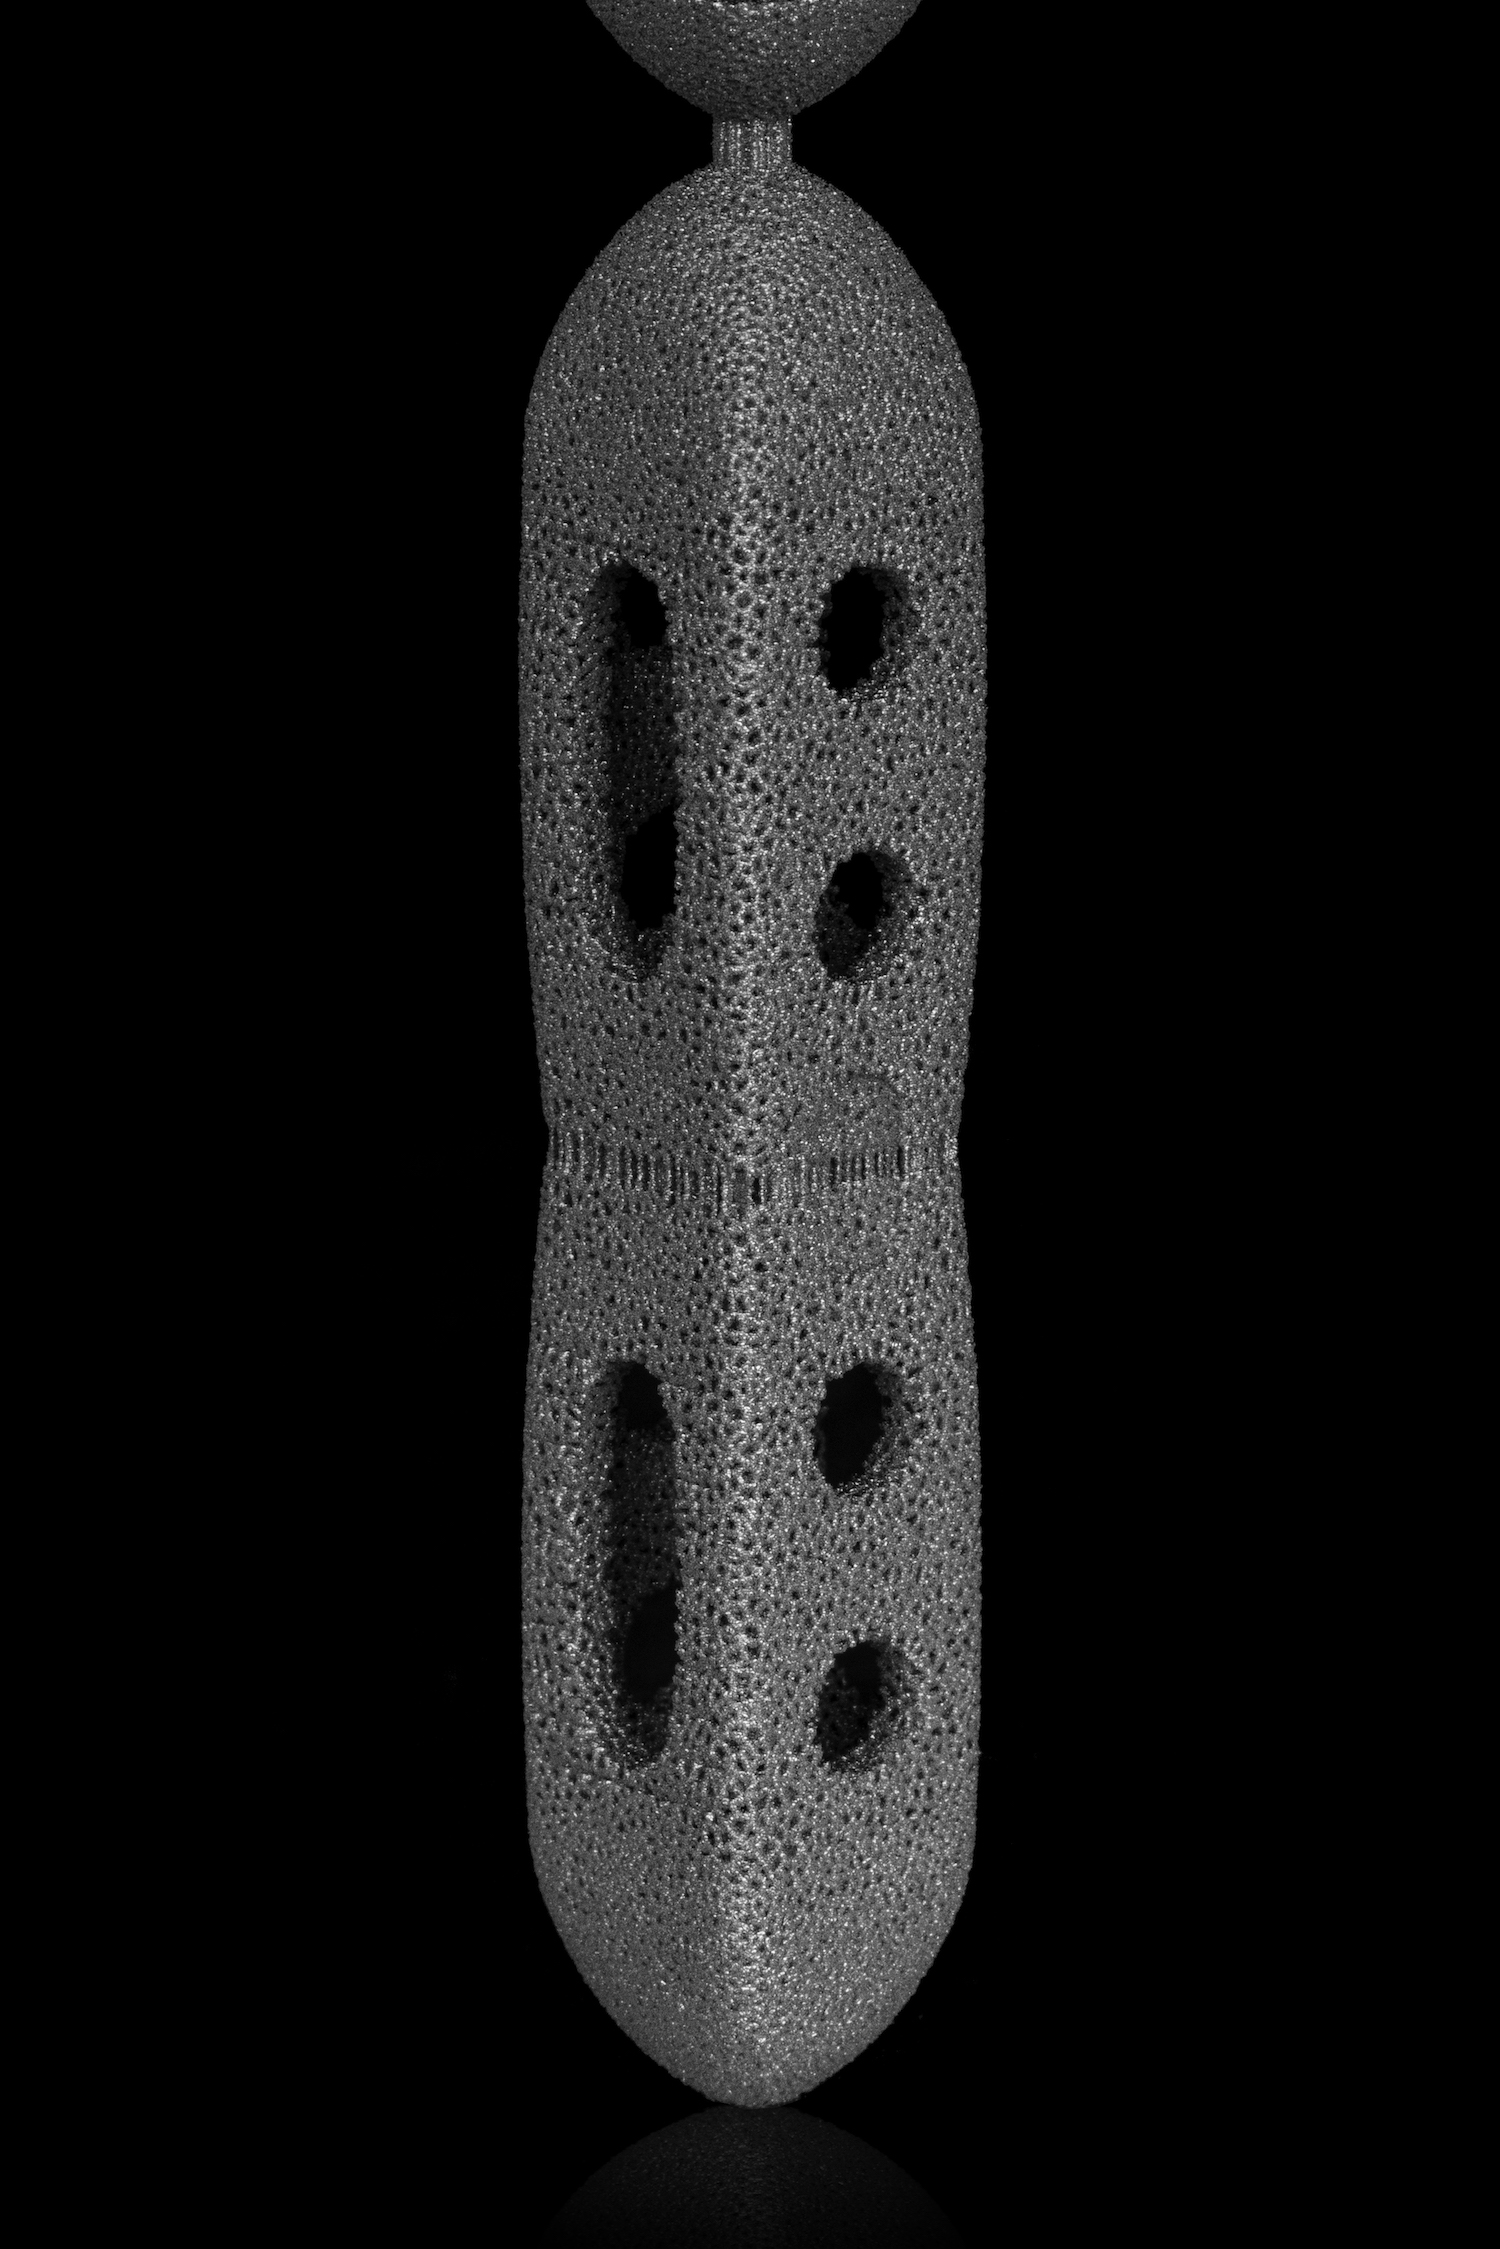 Betatype Engine Improves Orthopaedic Implant Internal Geometry